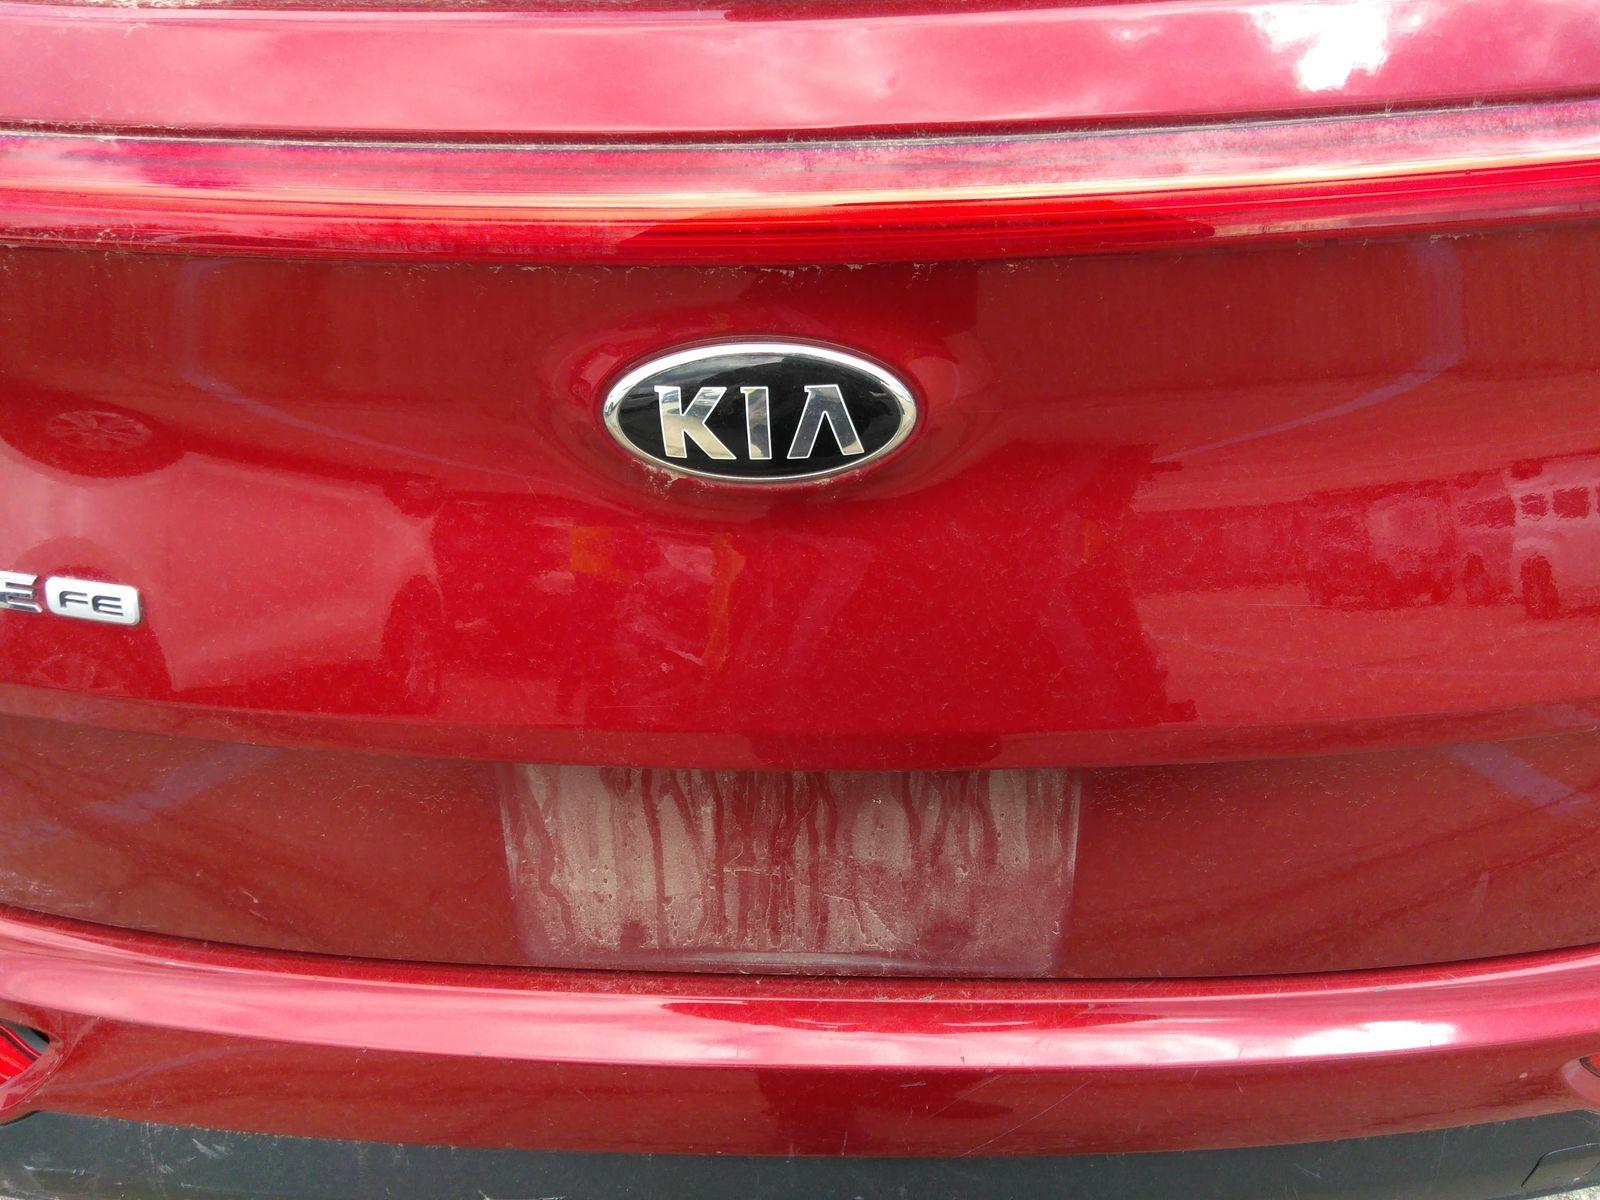 2019 KIA SPORTAGE FWD 4C LX - 7